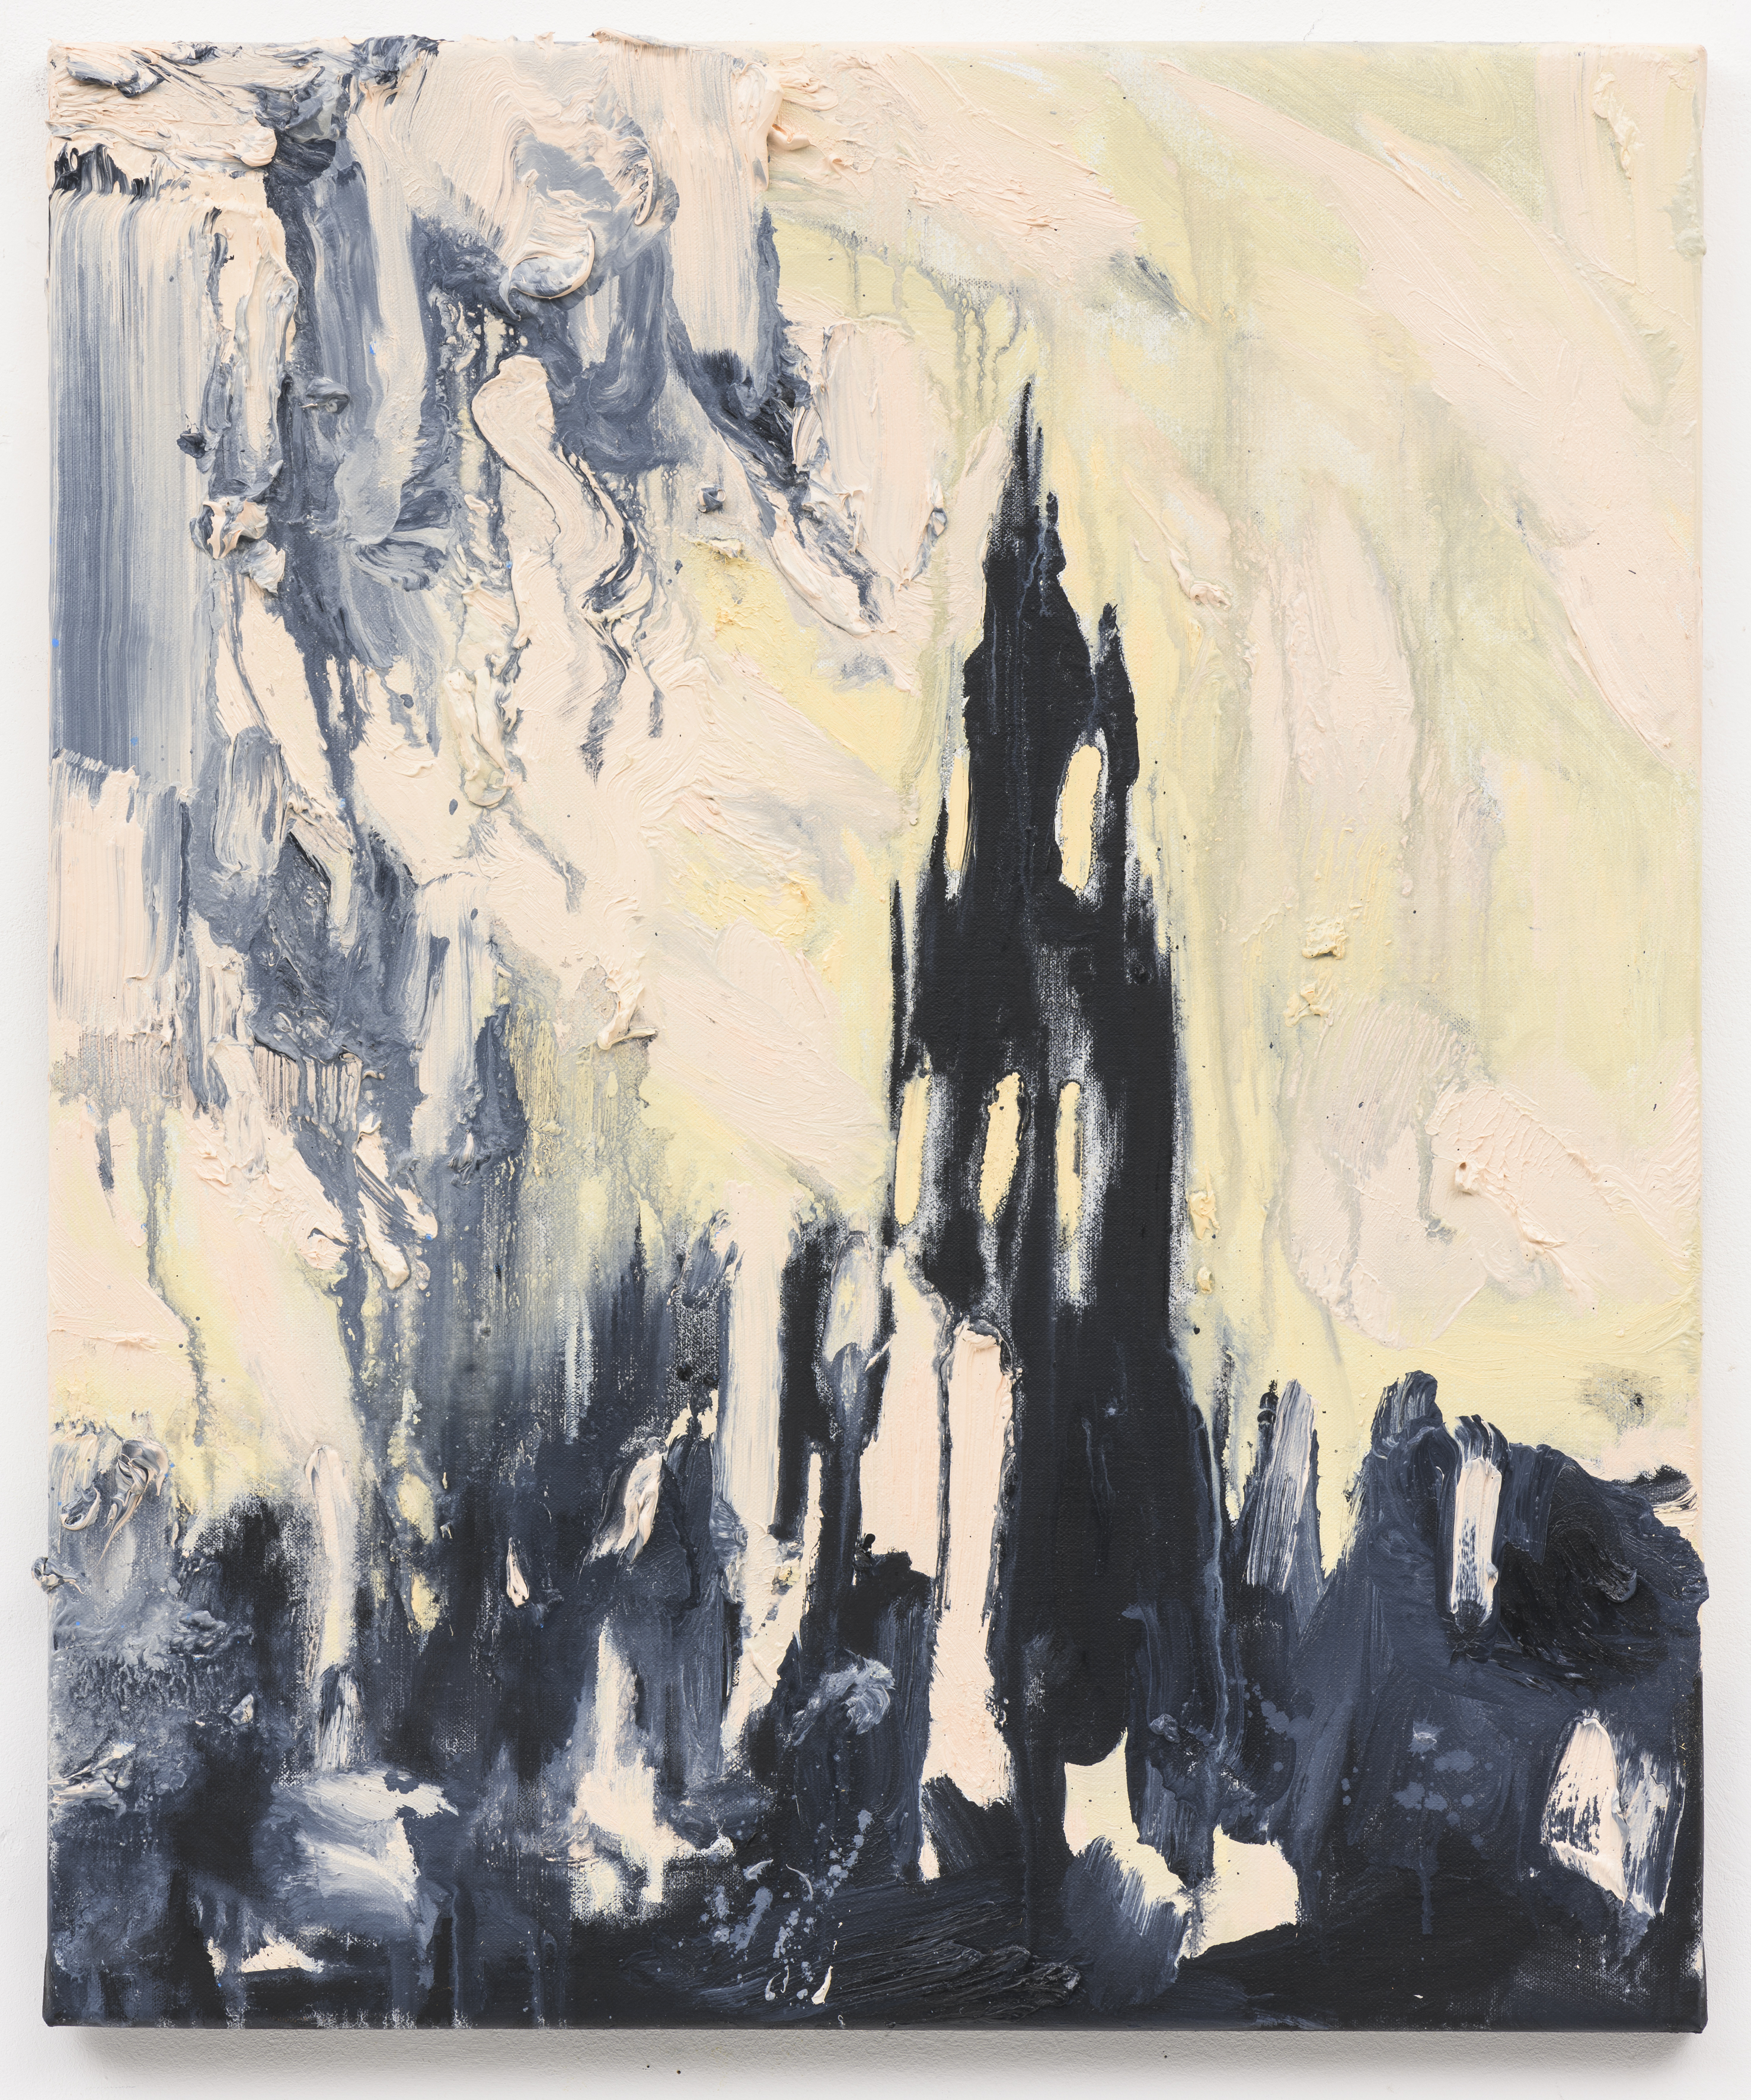 """Sichtbare Vergangenheit II"", 60 x 50 cm. oil on linen 2018 (Berlin)"